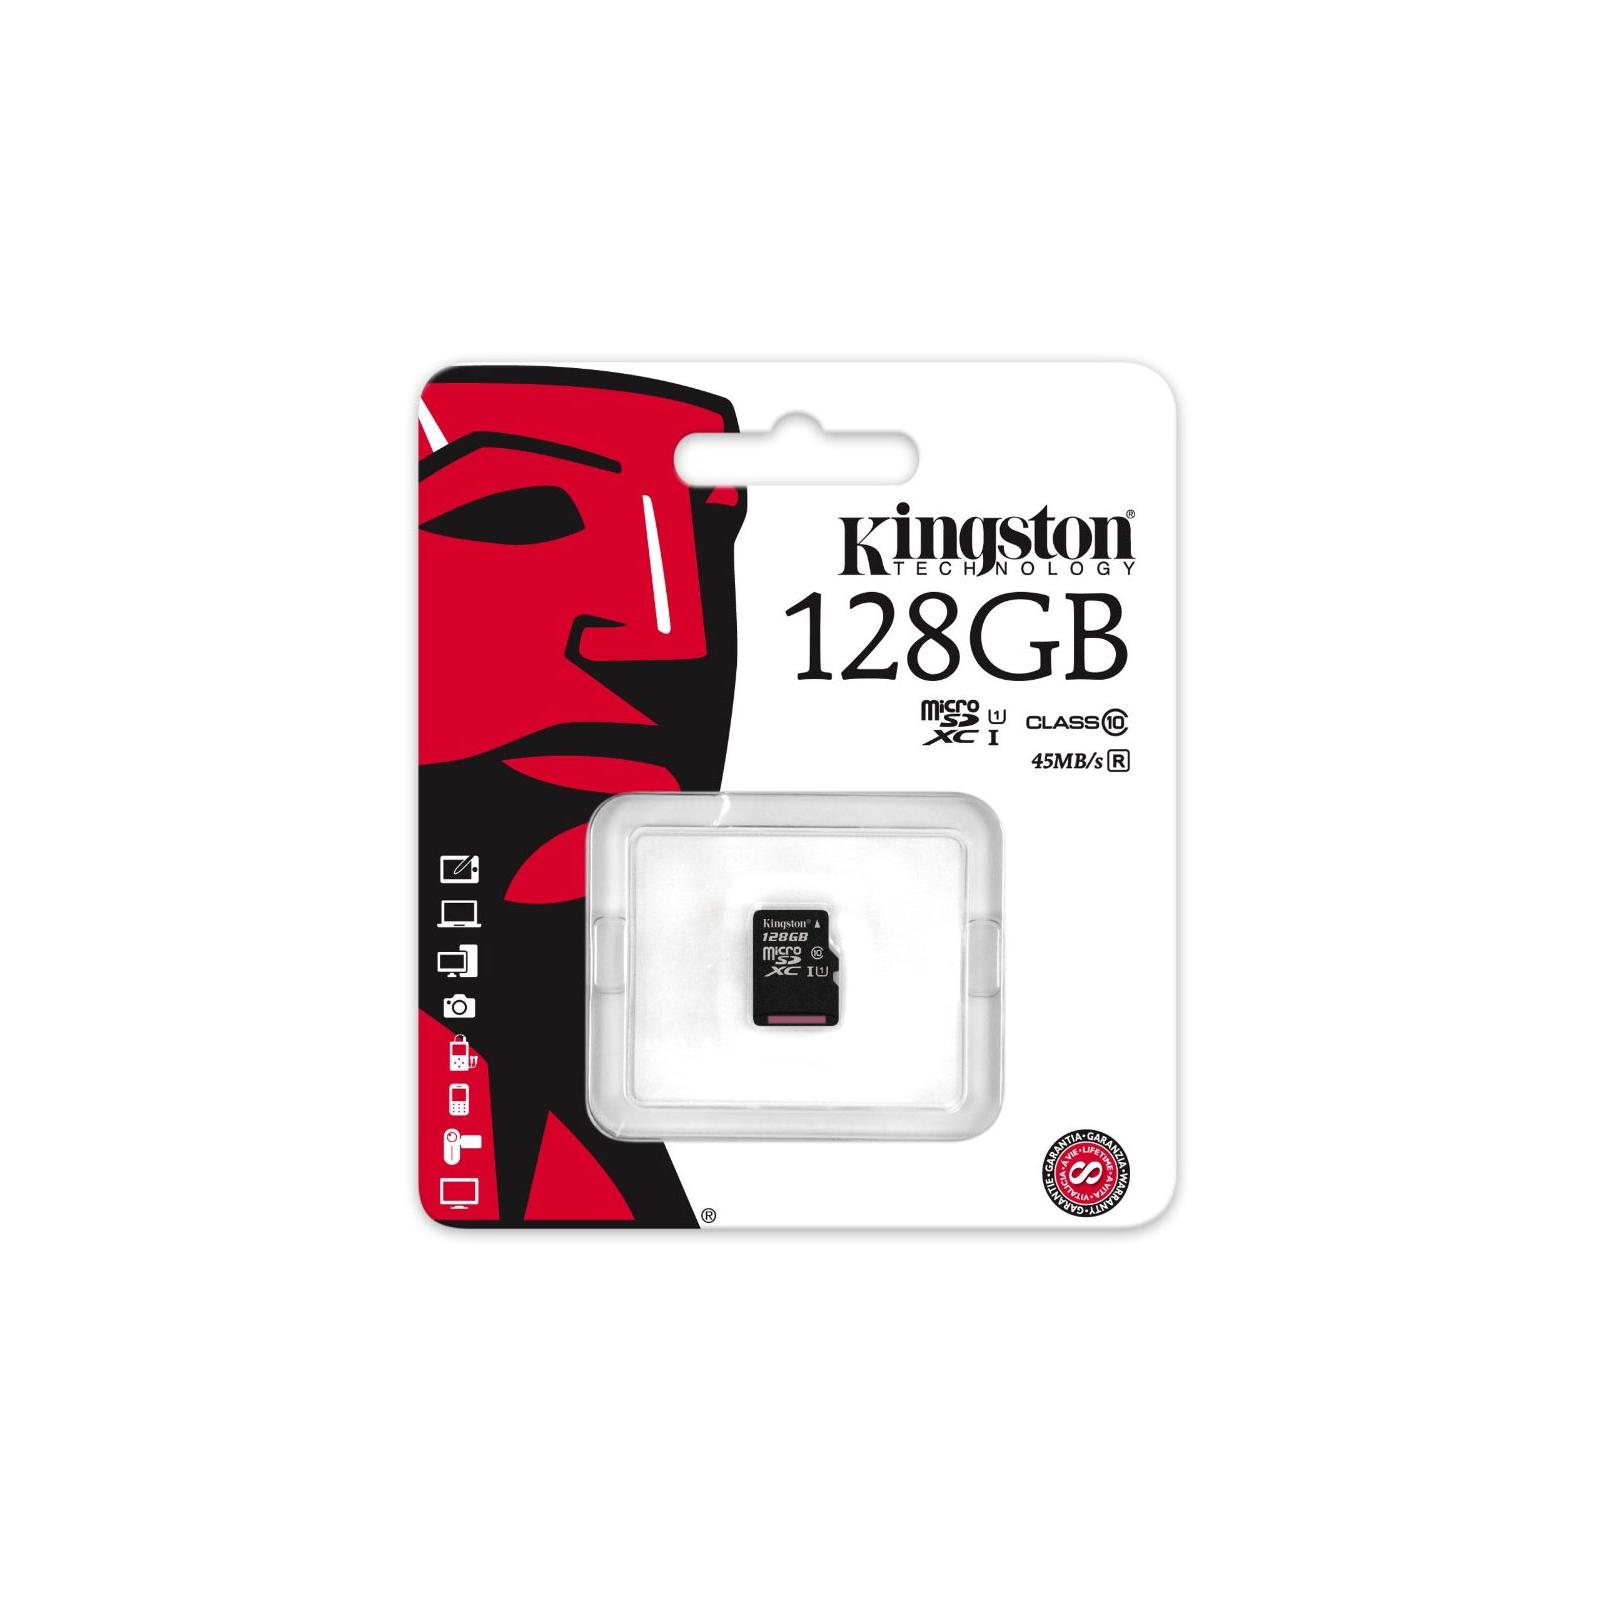 Карта памяти Kingston 128GB microSDXC Class 10 UHS| (SDC10G2/128GBSP) изображение 2